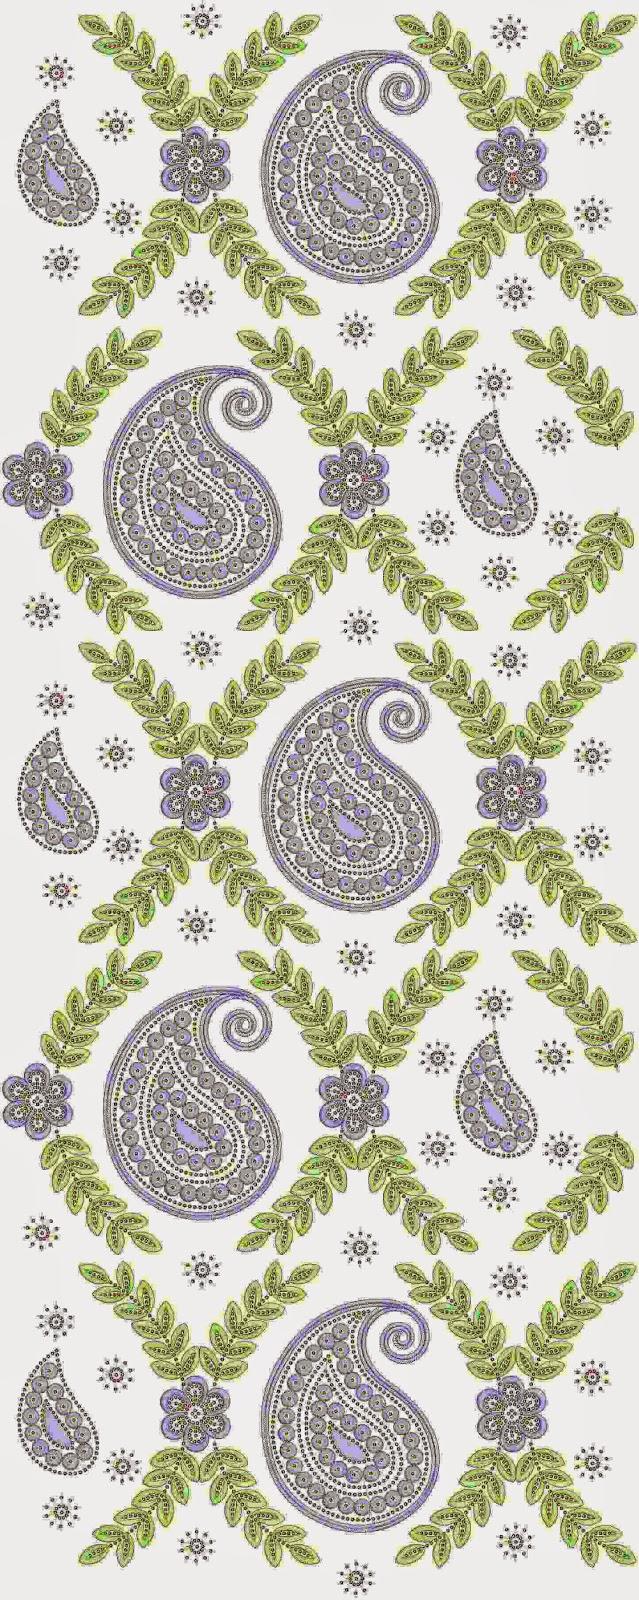 Nuwe Pakistani Applique borduurwerk